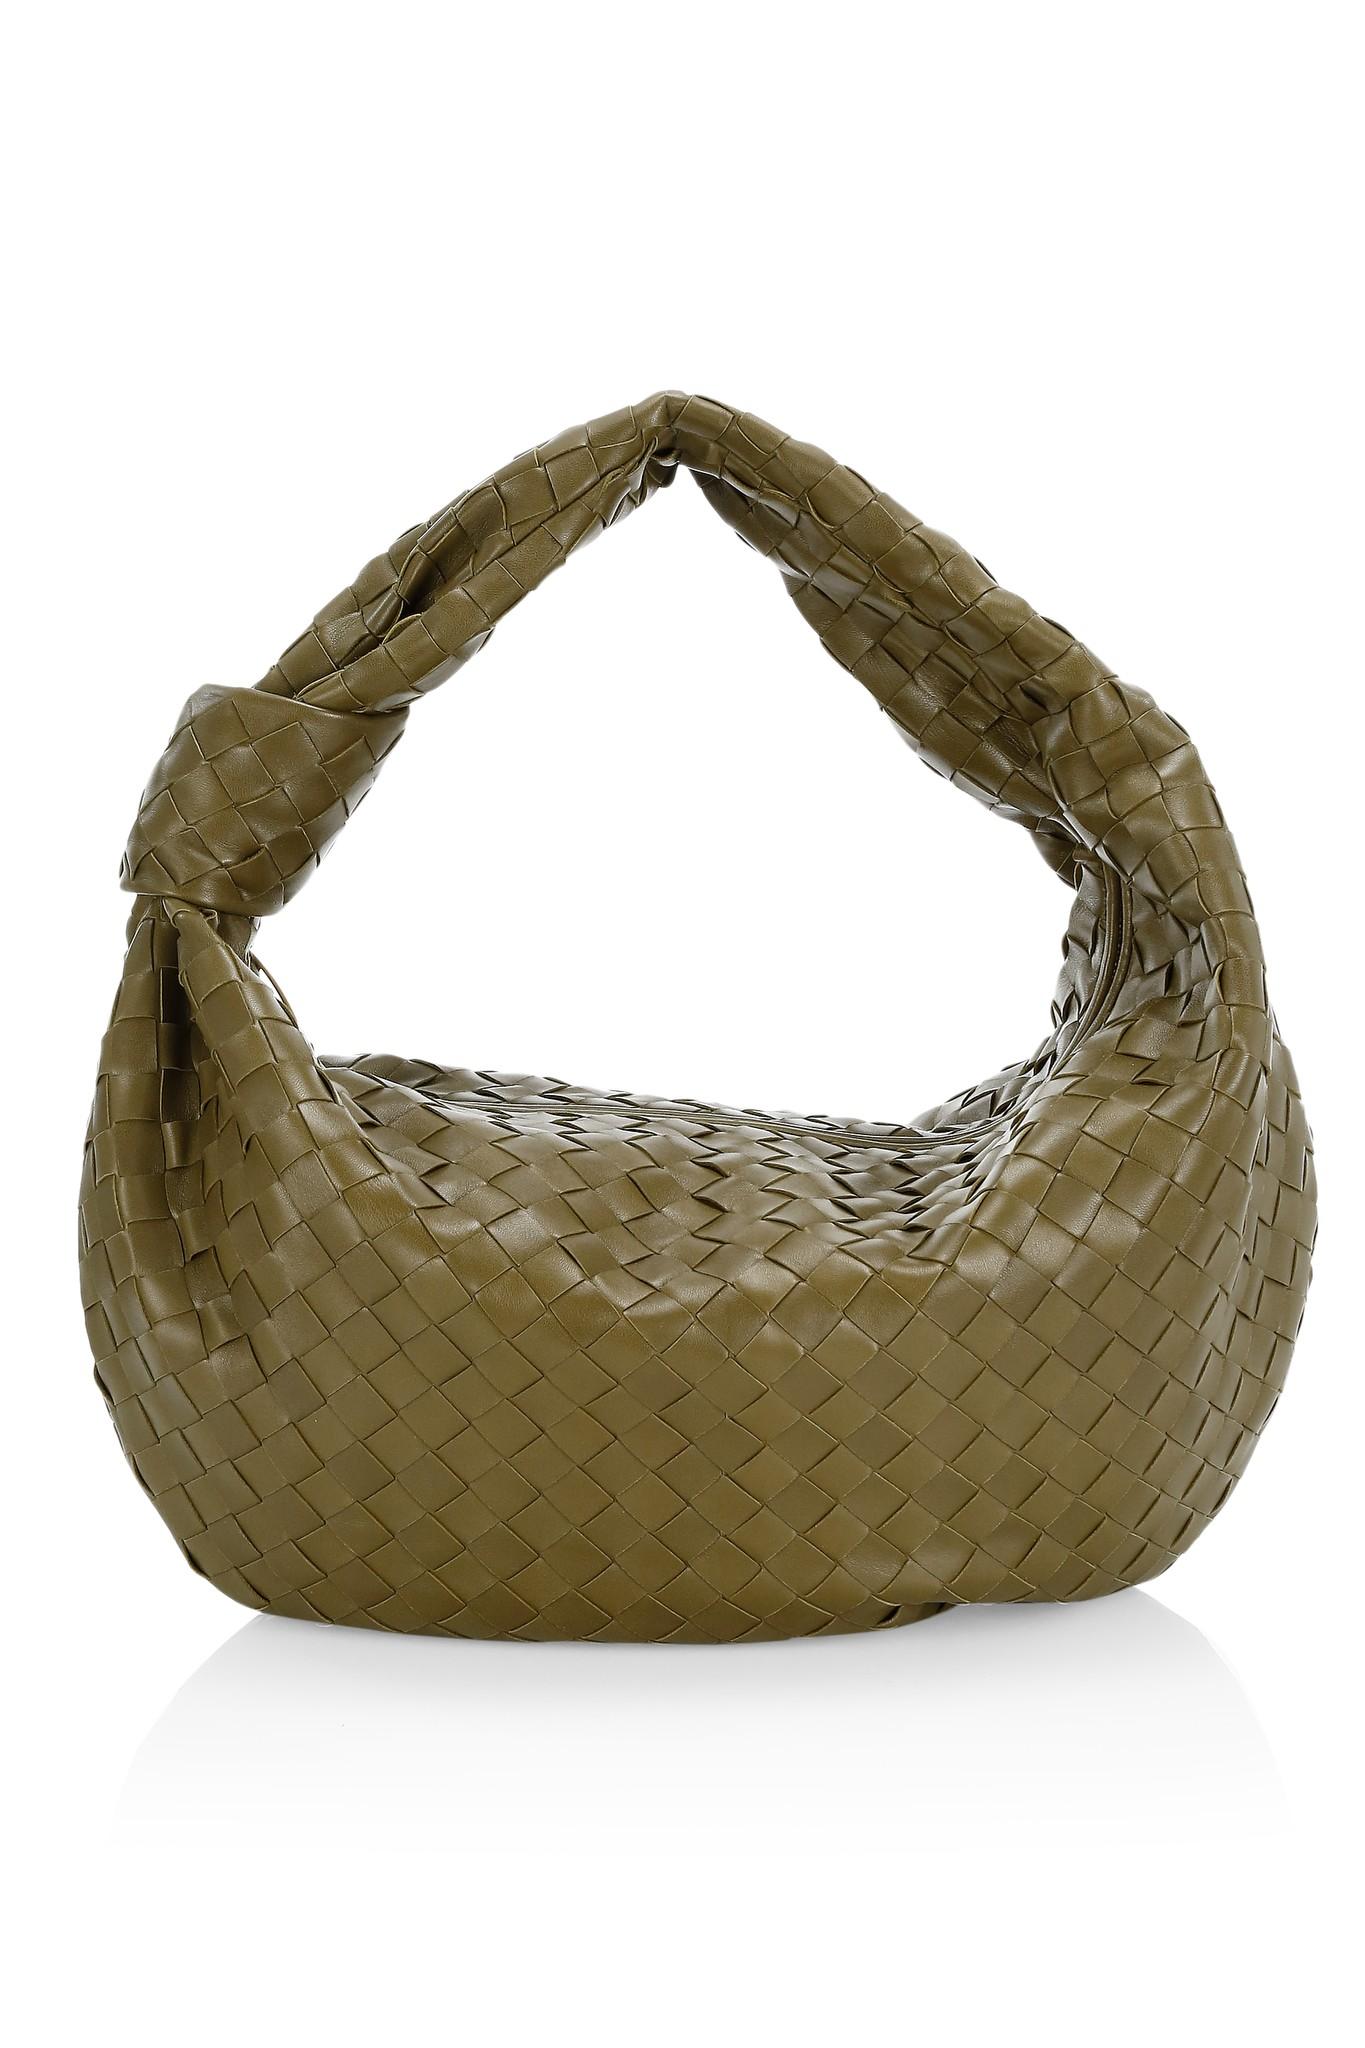 Bottega Veneta Jodie leather bag.